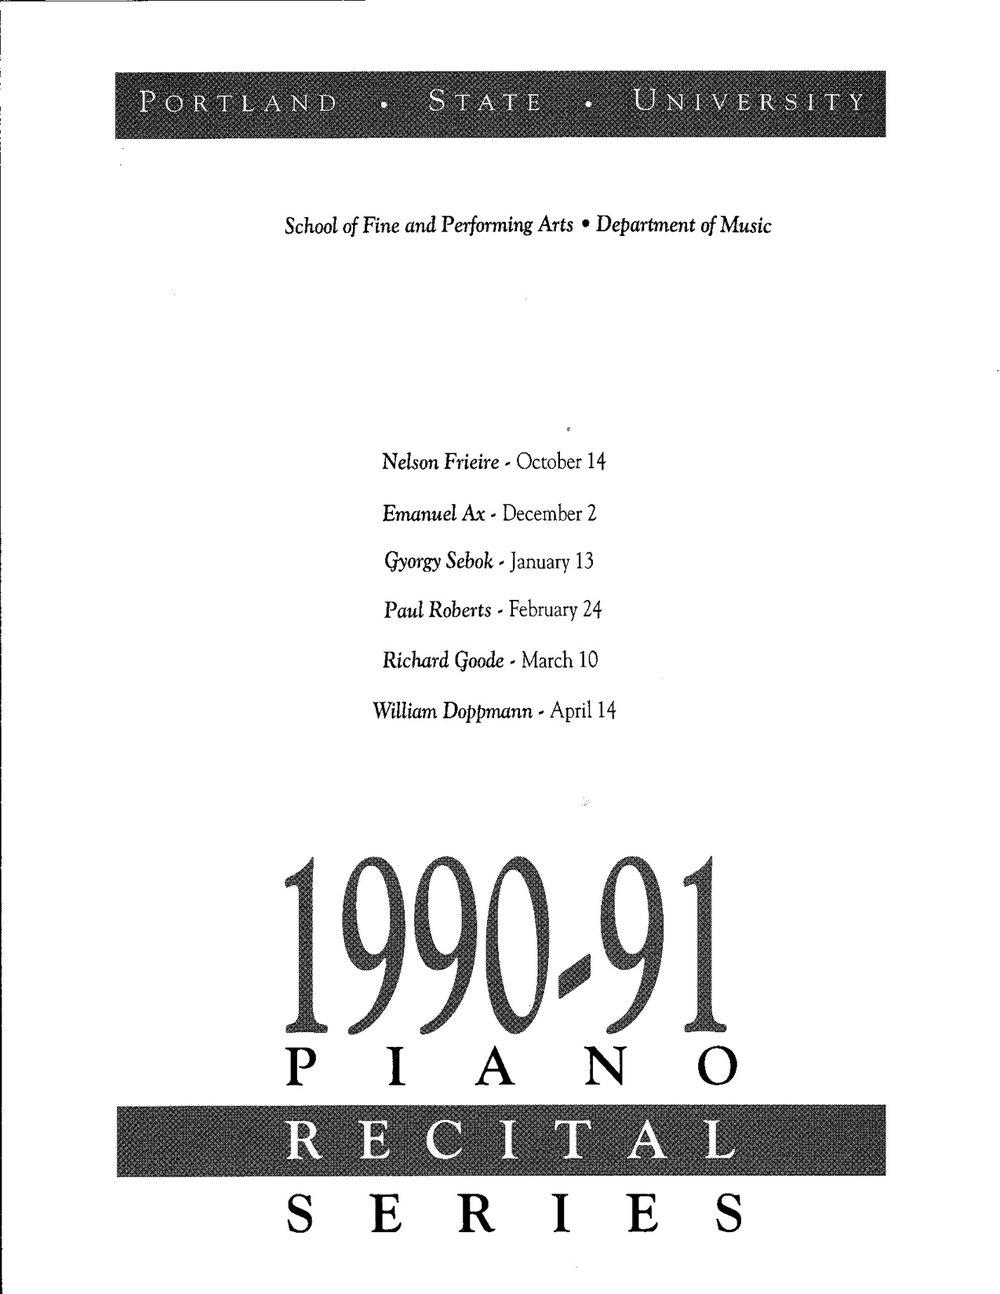 Roberts90-91_Program.jpg